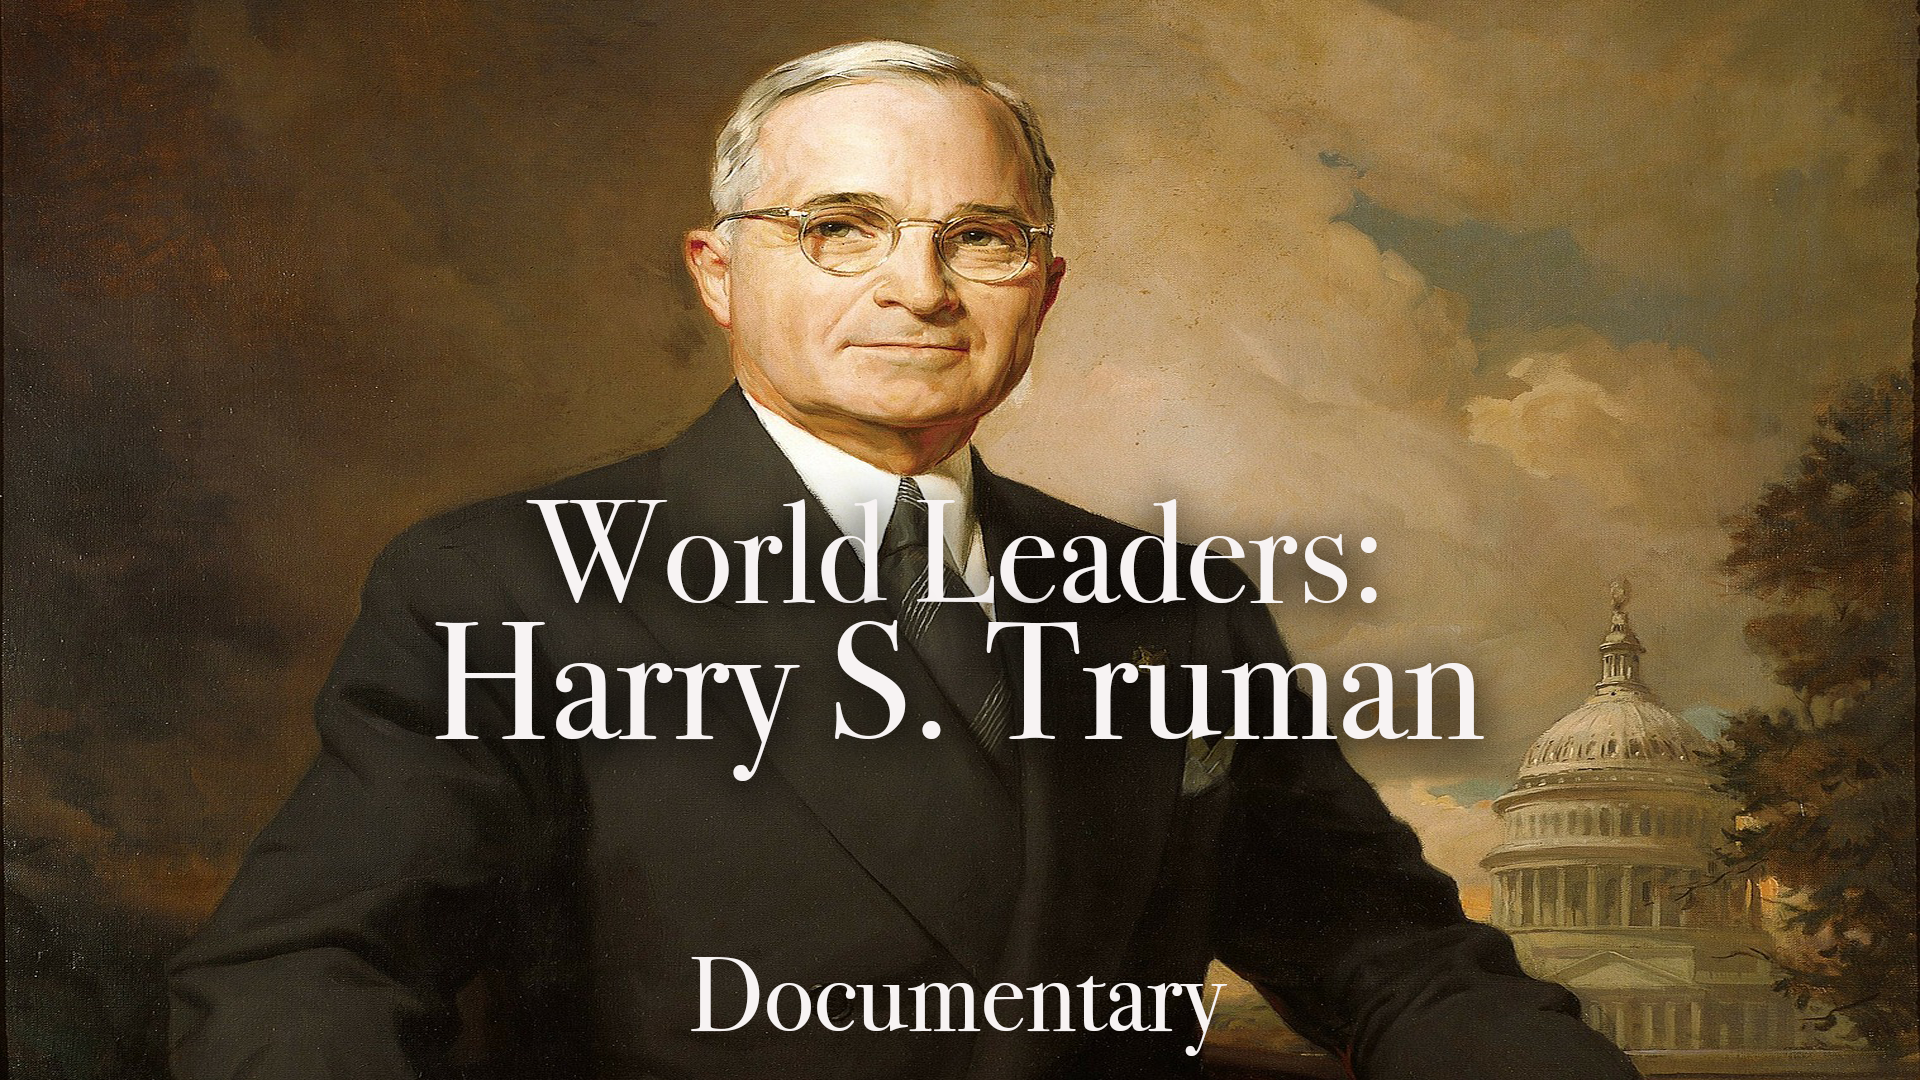 World Leaders: Harry S. Truman Documentary